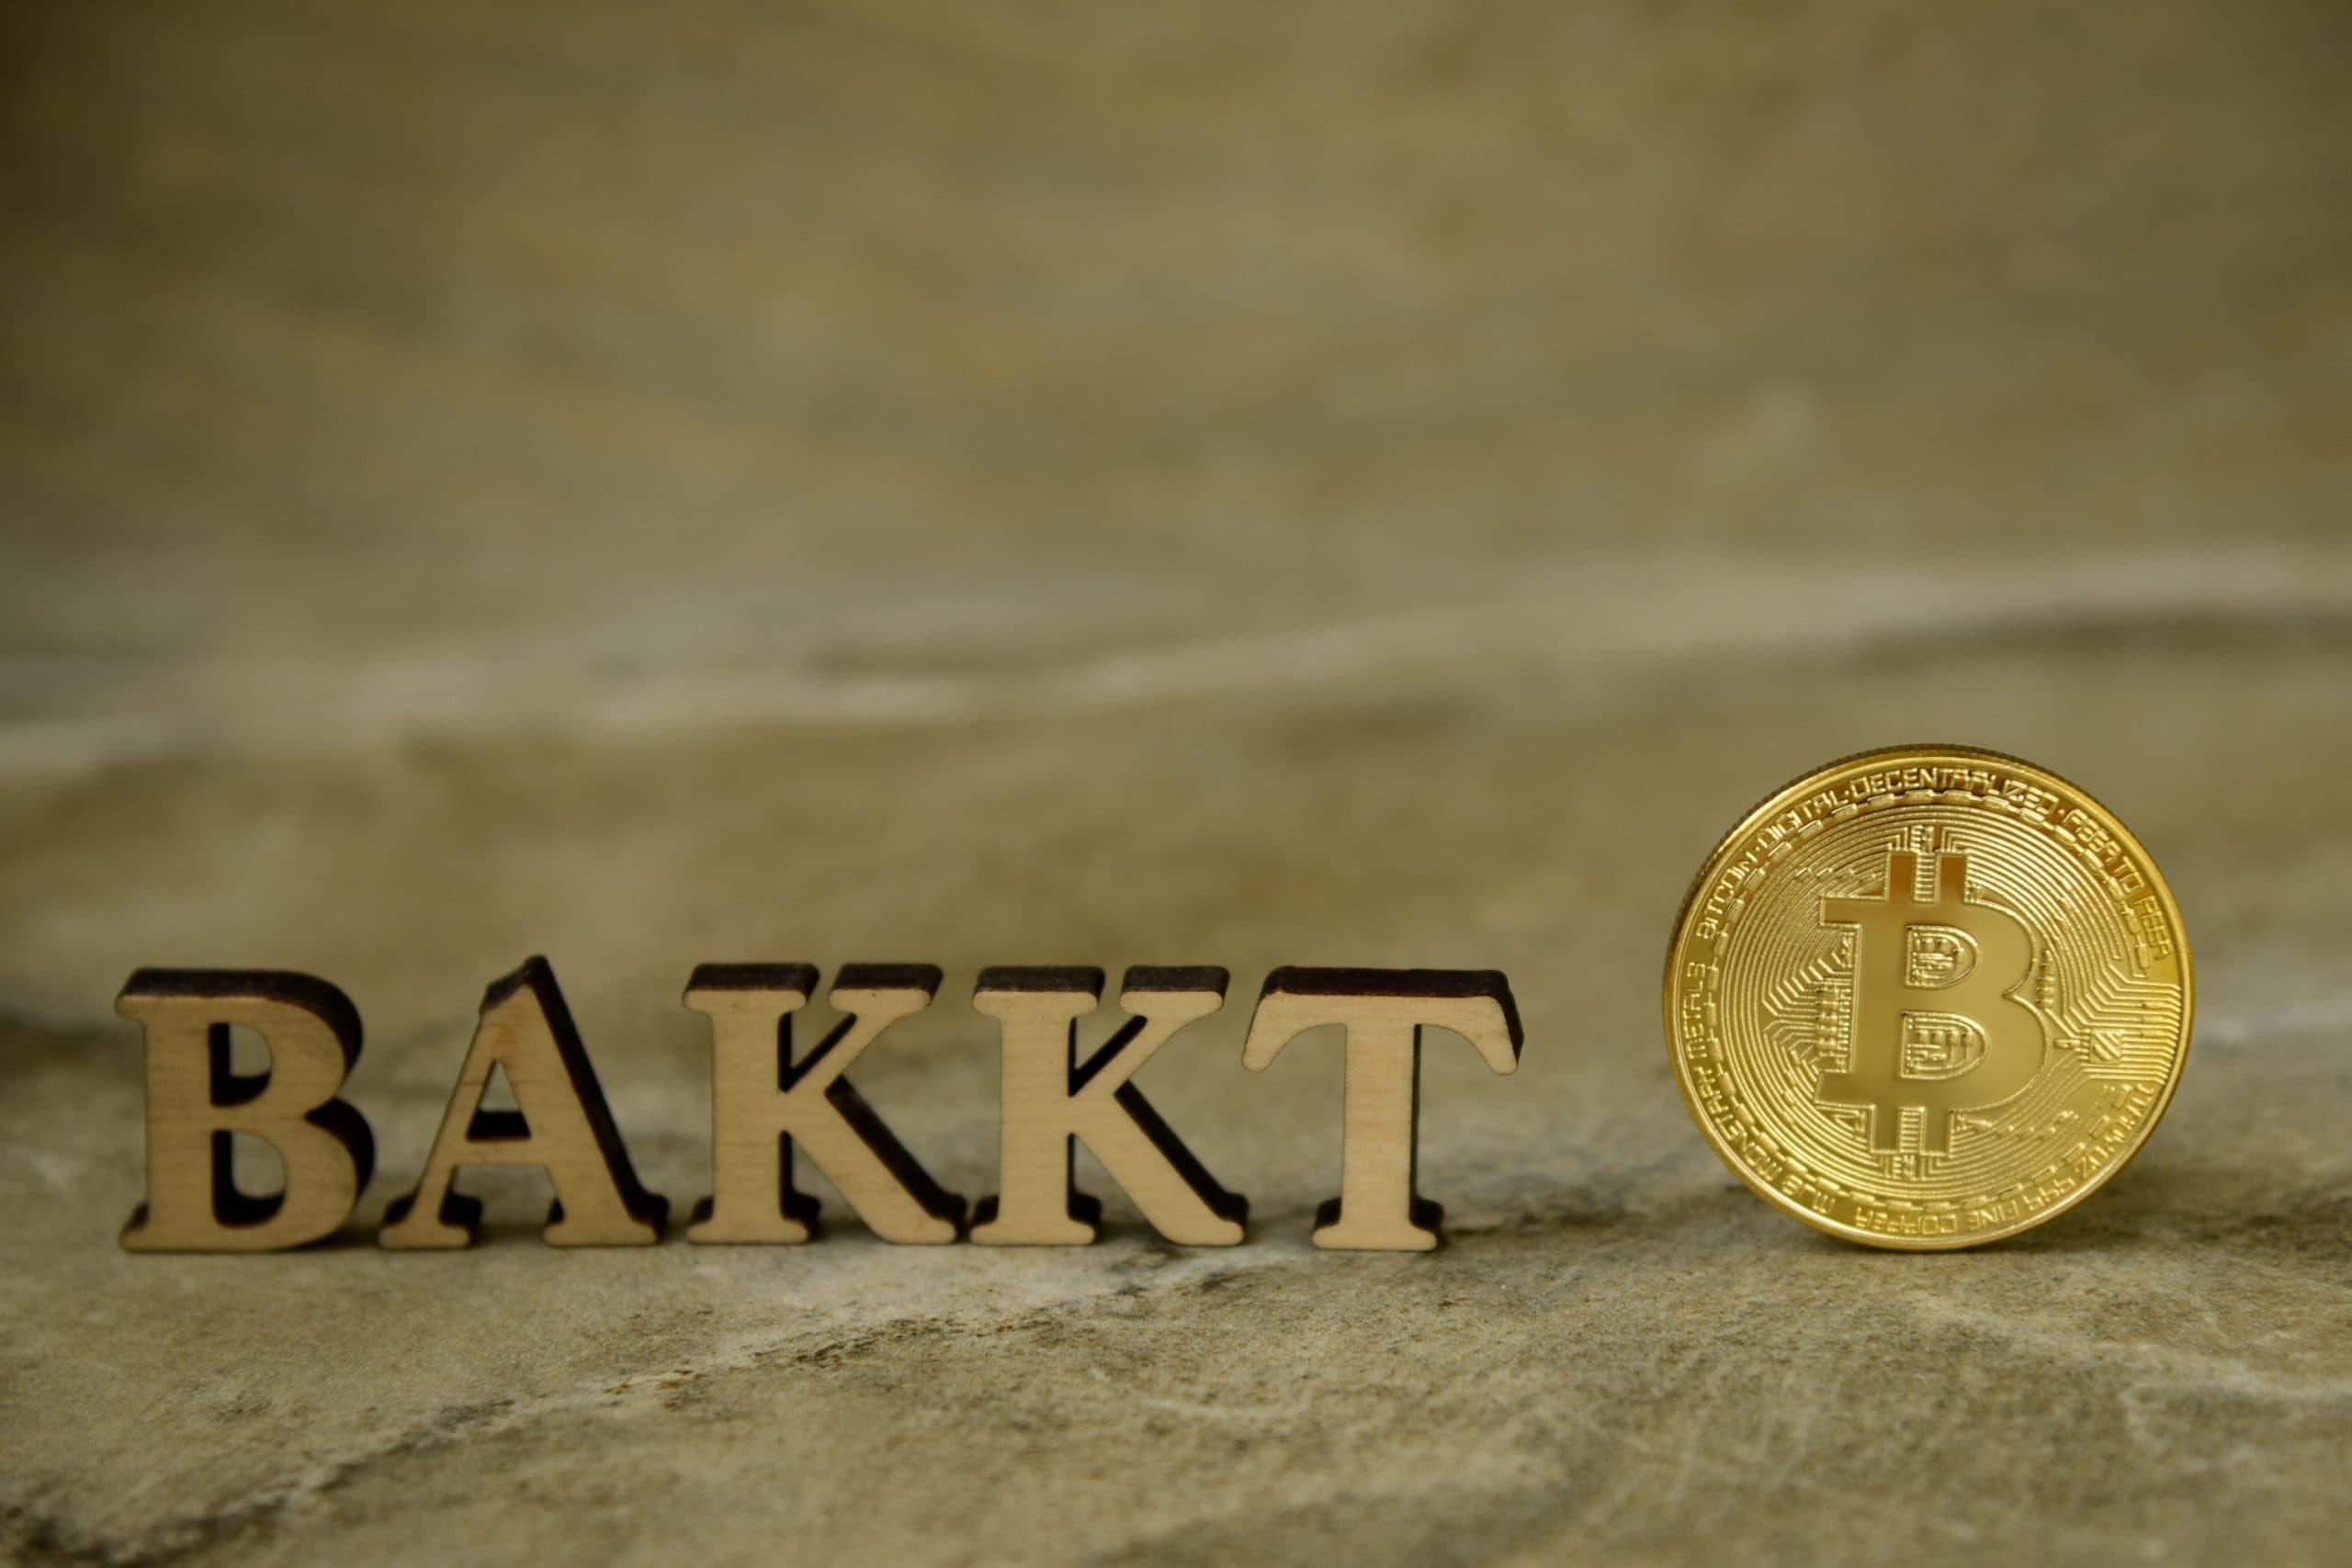 Bakkt: Börsengang einer Bitcoin-Futures-Plattform   BTC-ECHO